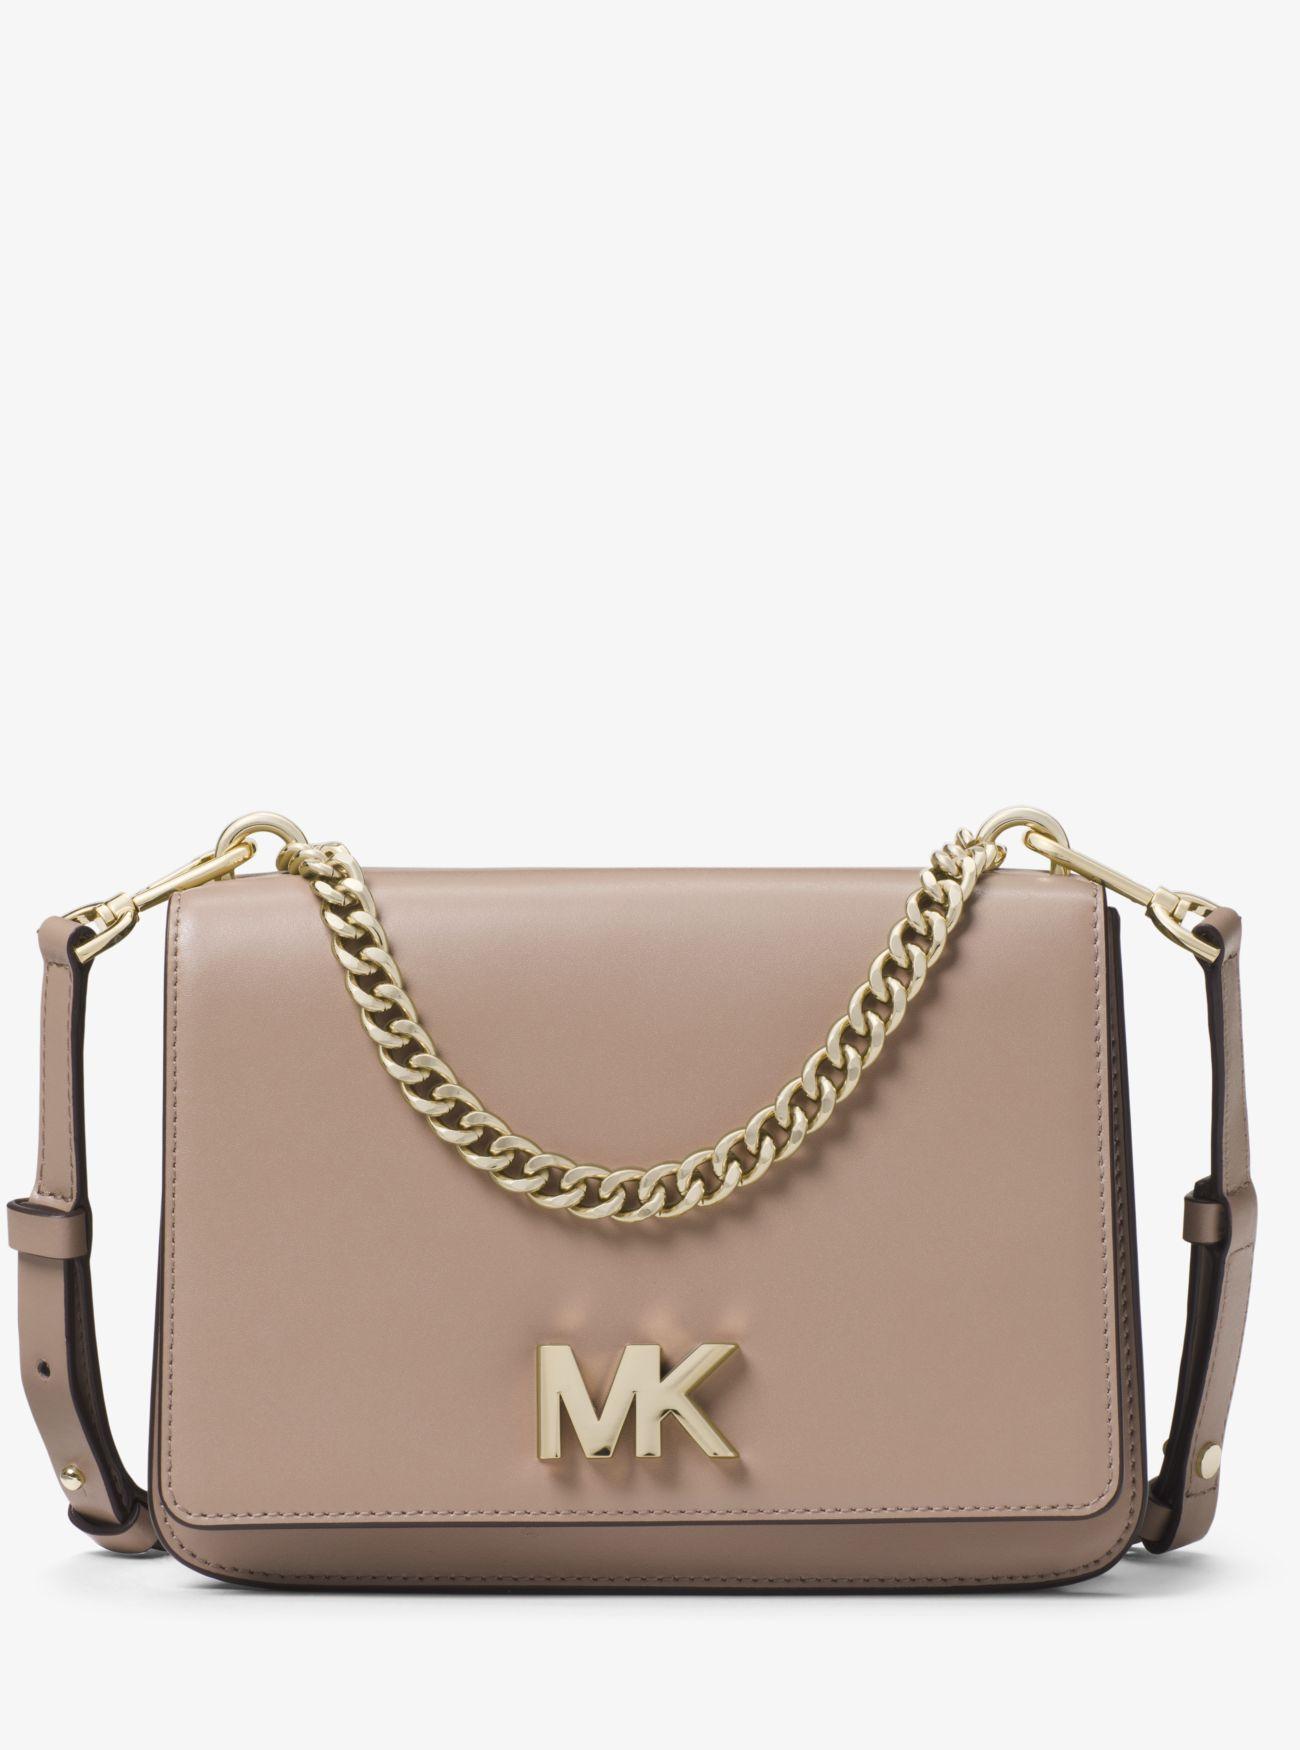 579368c7416d91 Michael Kors Mott Large Leather Crossbody Bag - Save 55% - Lyst